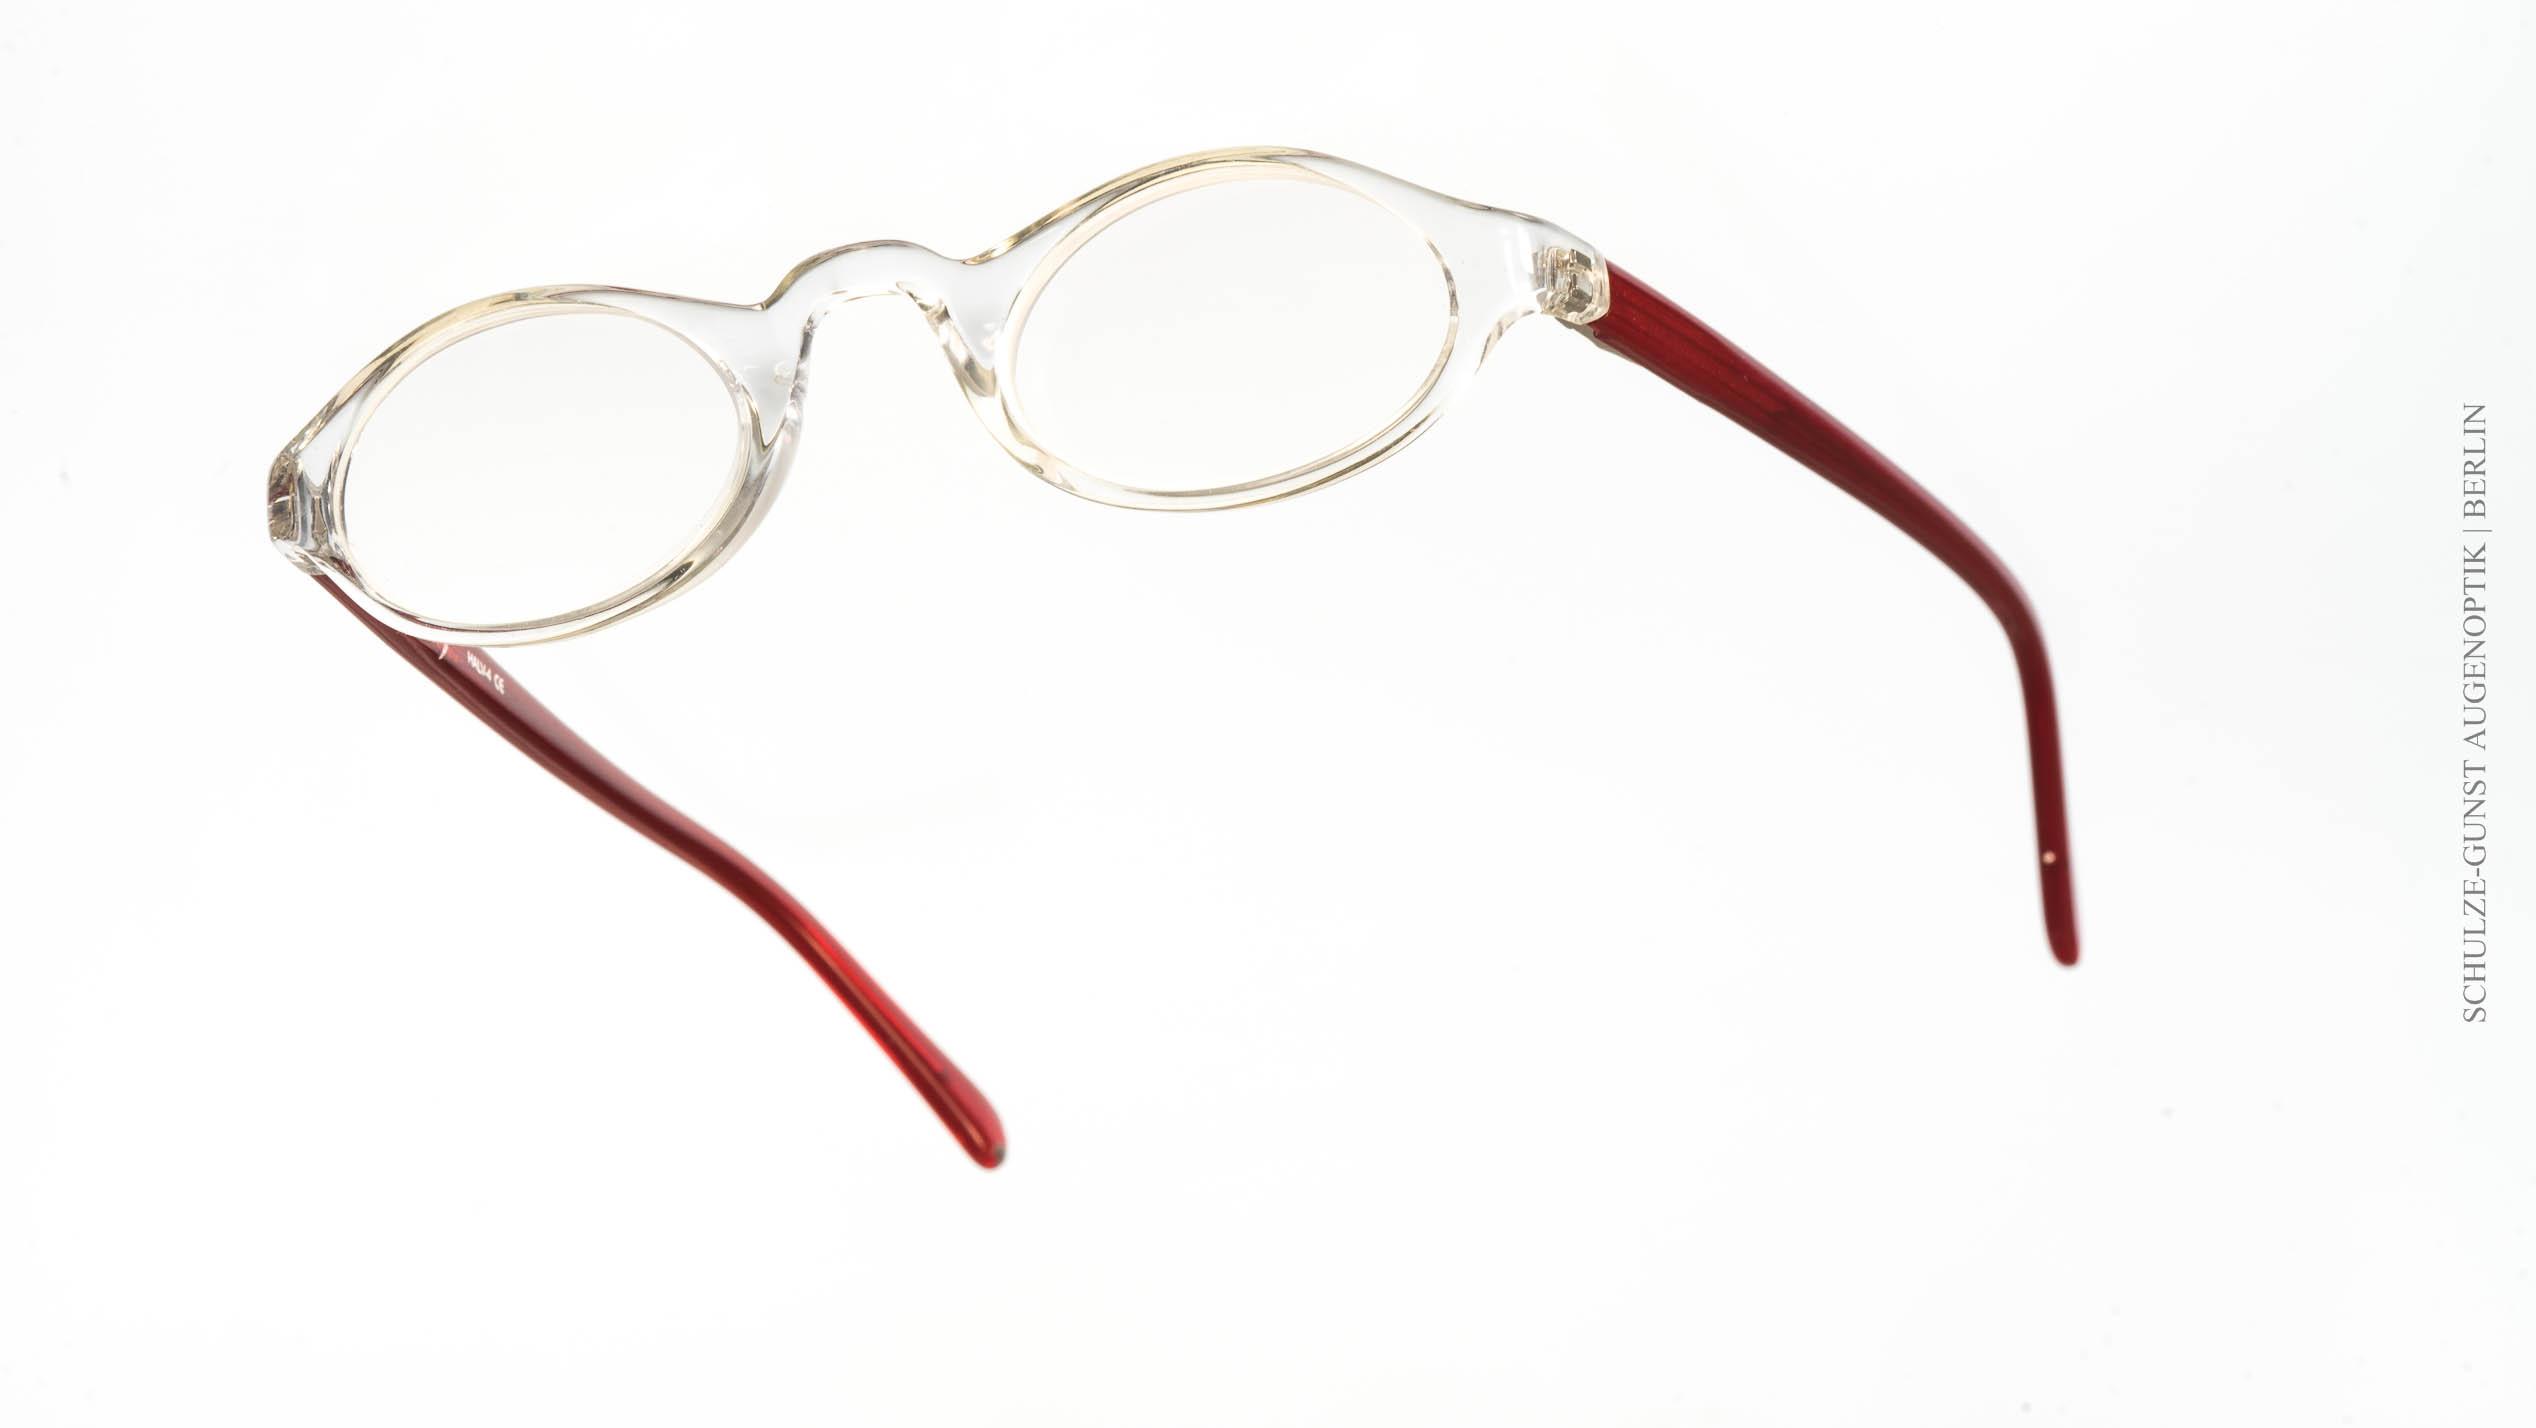 Lupenbrille - vergrößernde Sehhilfen